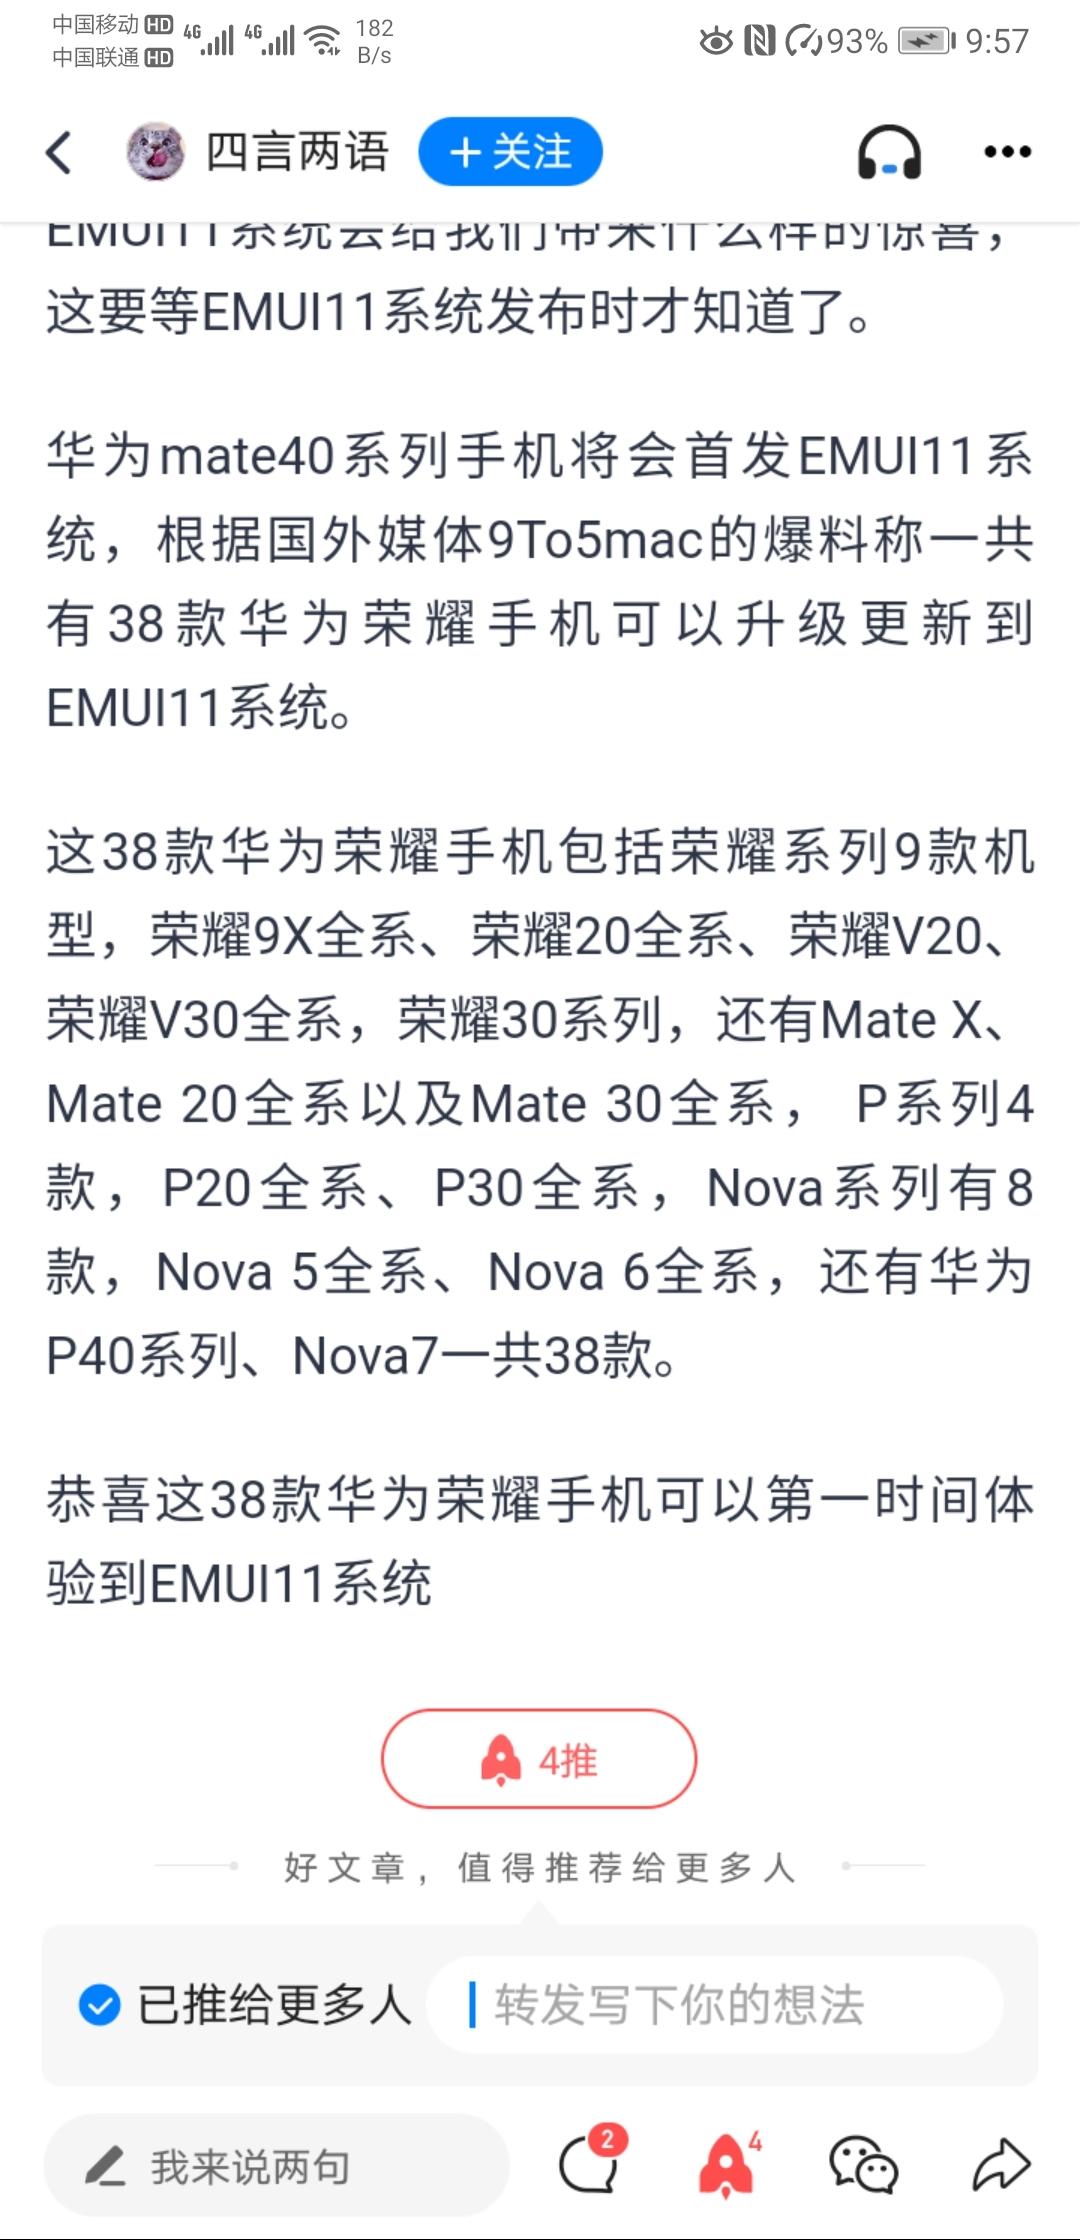 Screenshot_20200515_095730_com.tencent.news.jpg